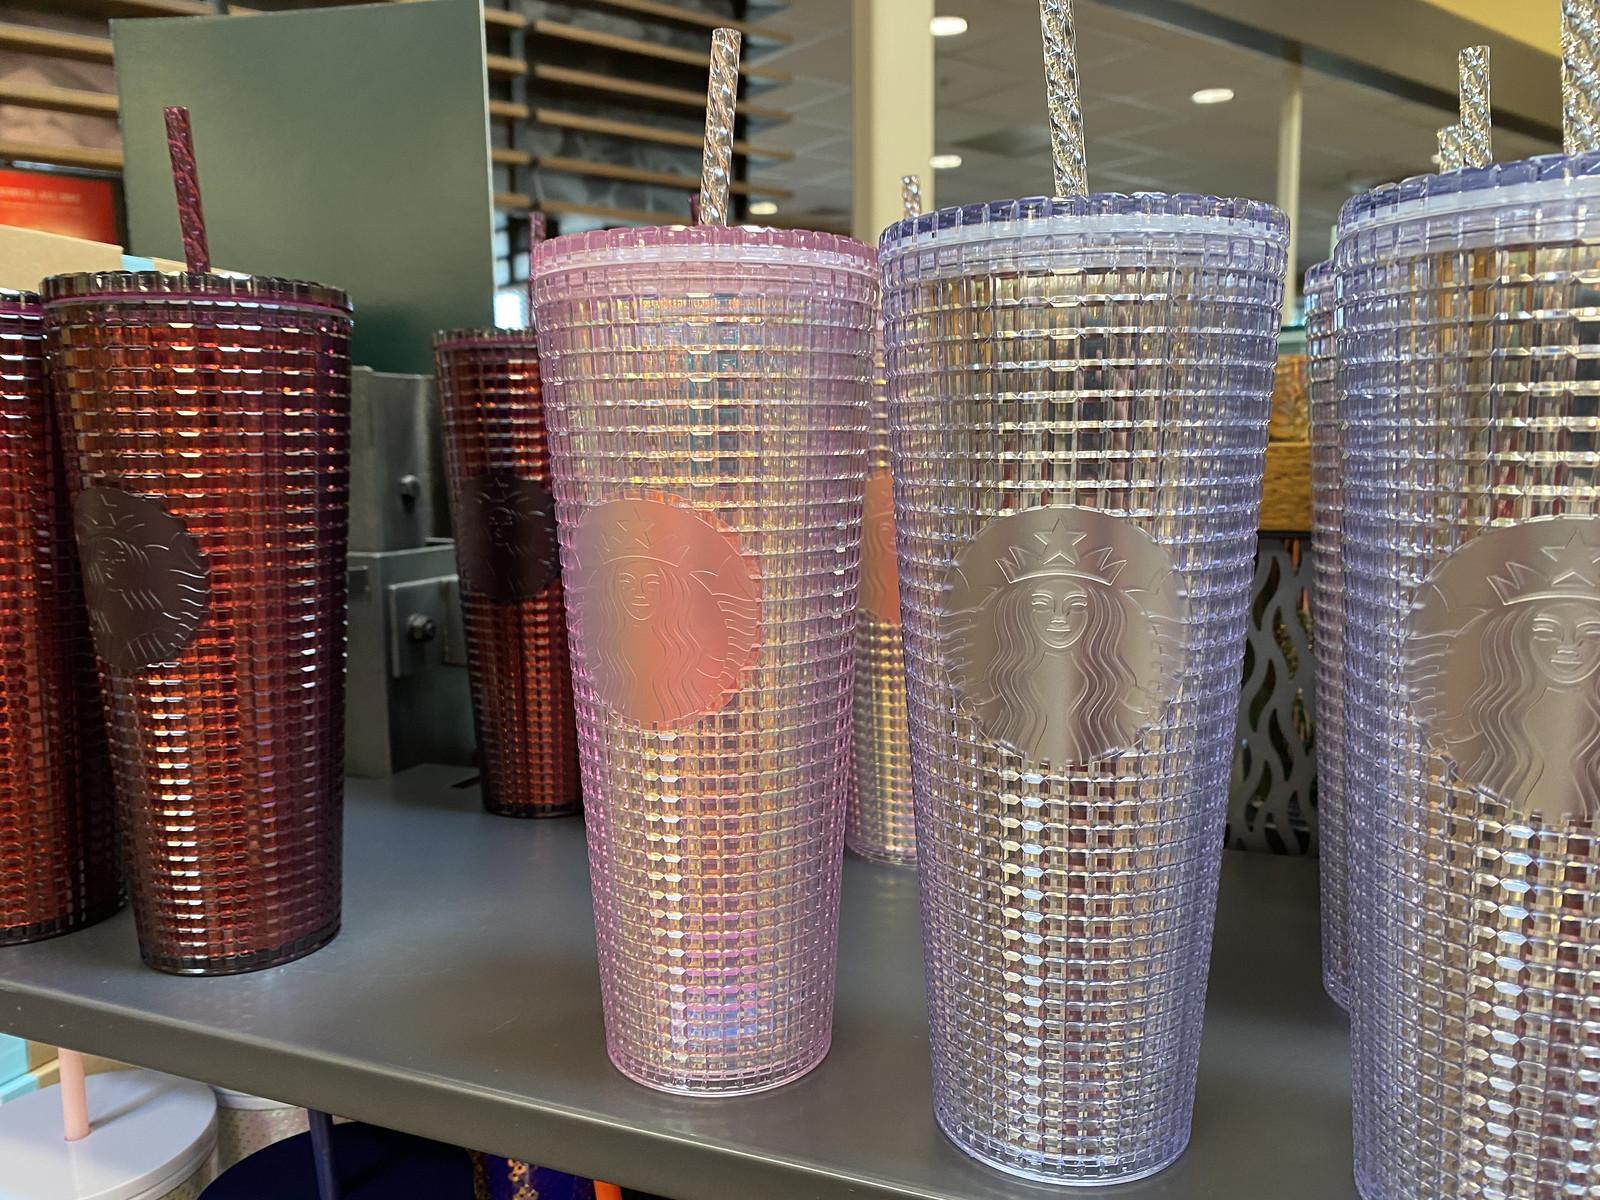 Pink Grip Starbucks Tumbler shown on shelf in store